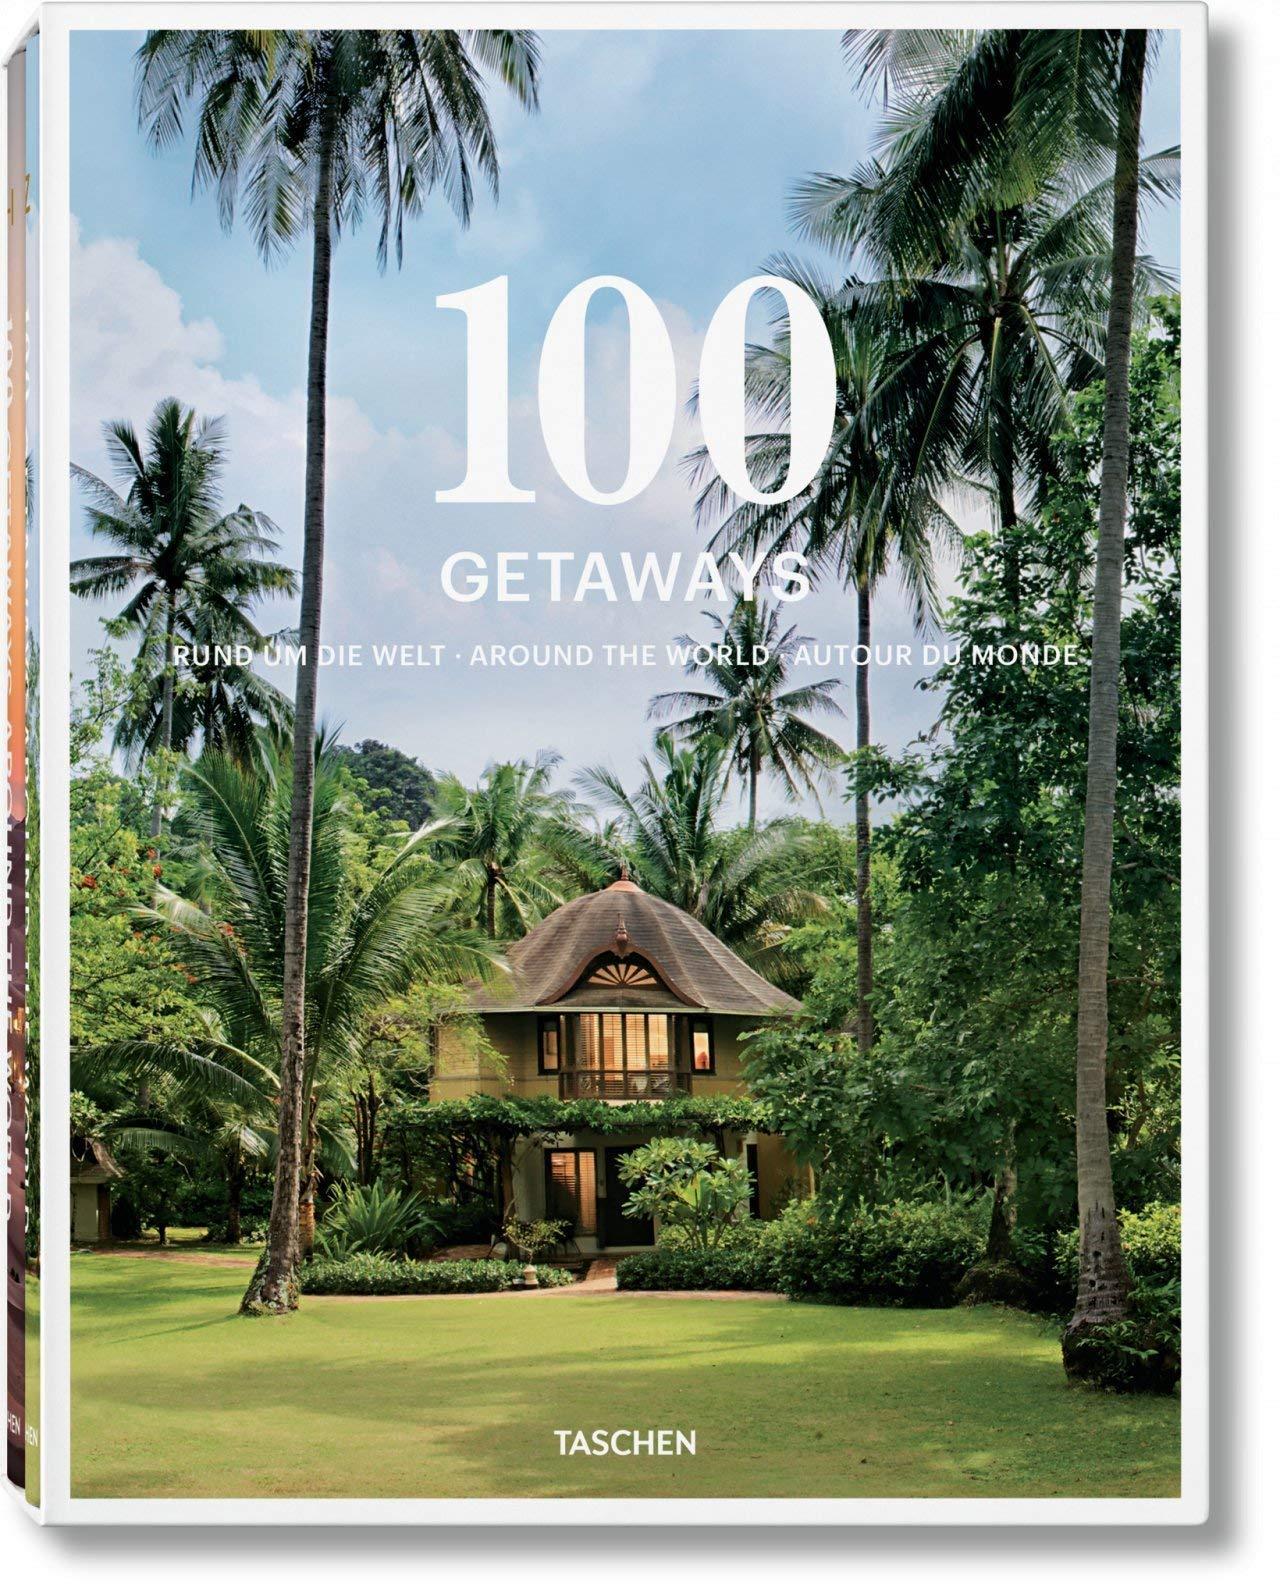 100 Getaways around the World 2 Volume Slipcase Idioma Inglés : JU: Amazon.es: Mayer, Margit J.: Libros en idiomas extranjeros